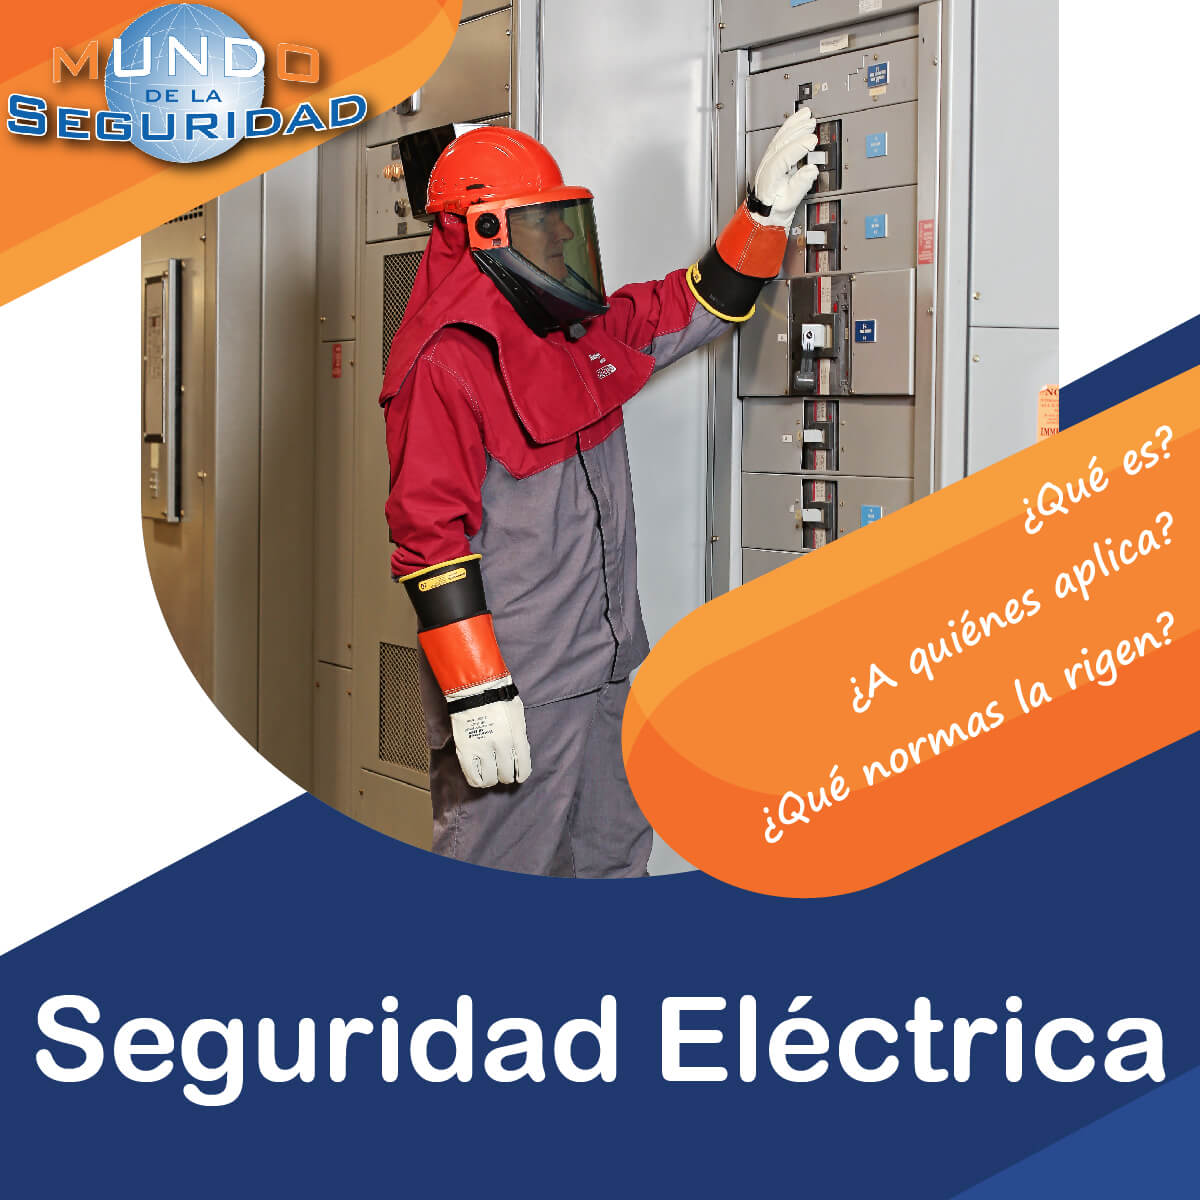 Seguridad eléctrica Honeywell